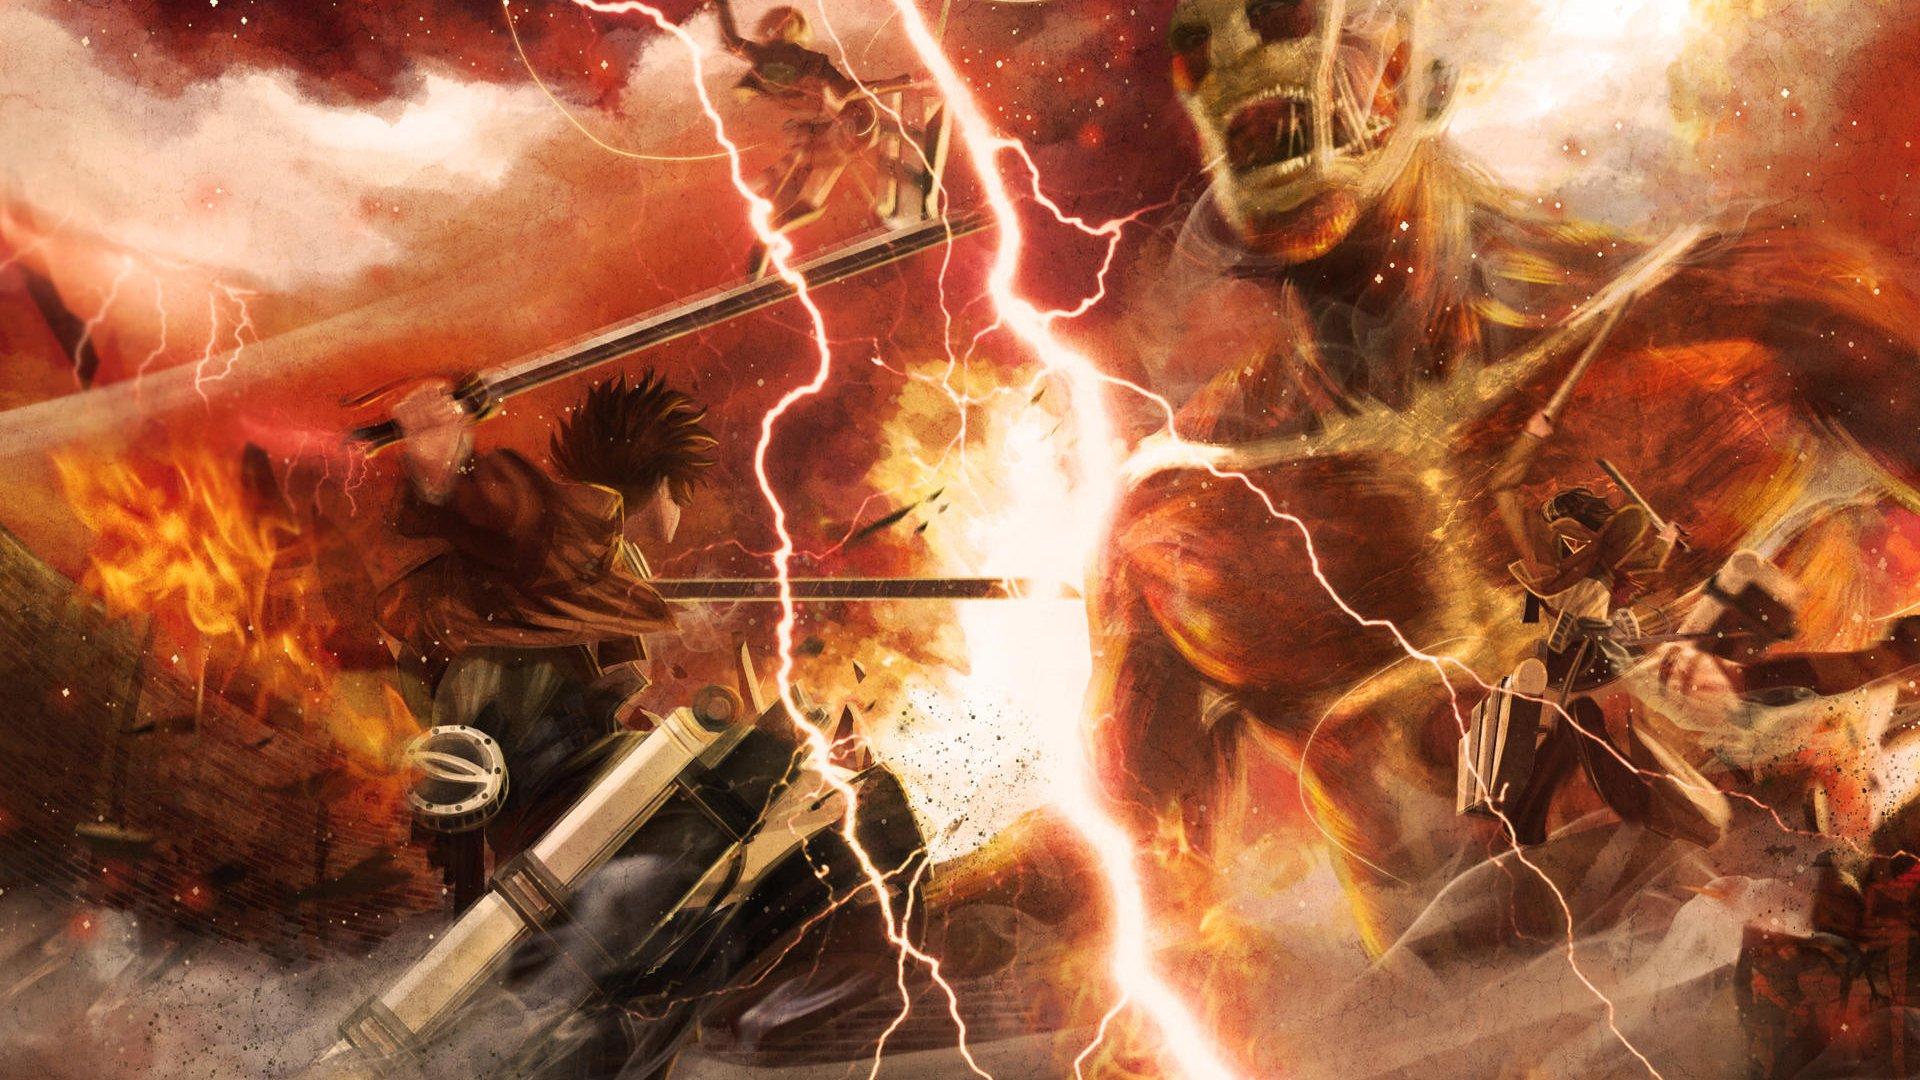 attack on titan wallpaperGdLevi 1920x1080